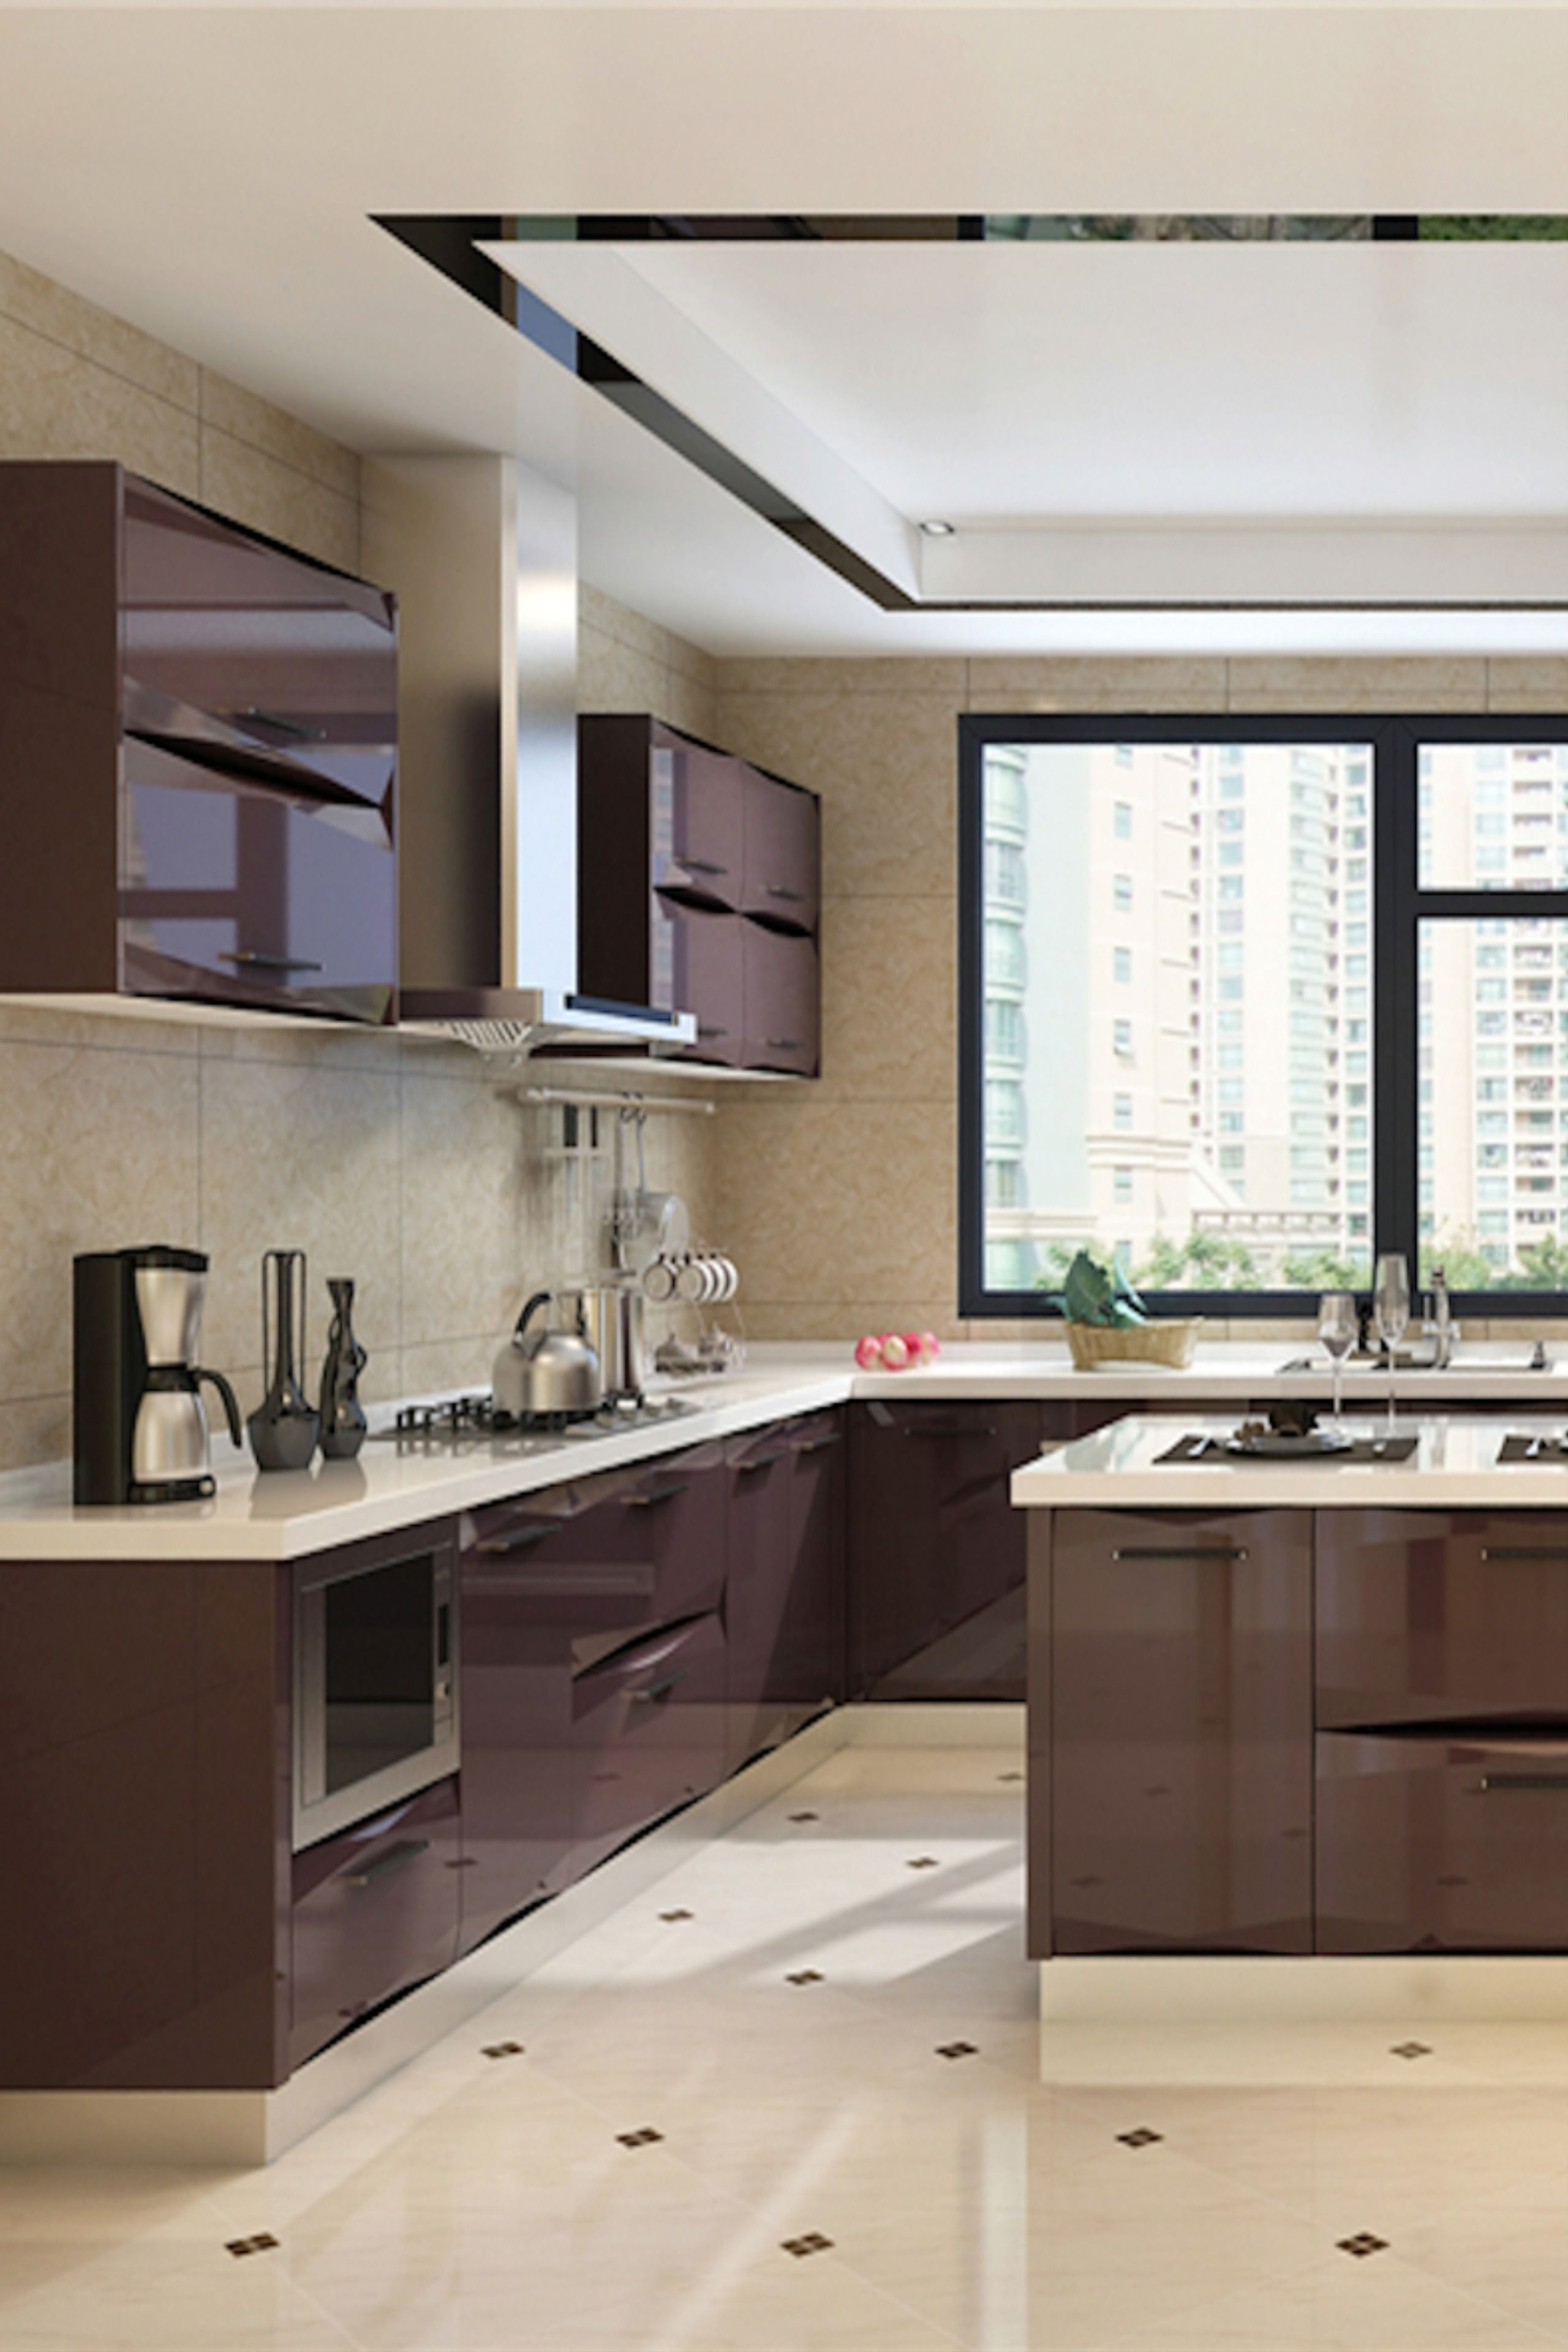 Lacquer Kitchen Cabinet | Kitchen cabinet design, Elegant ...